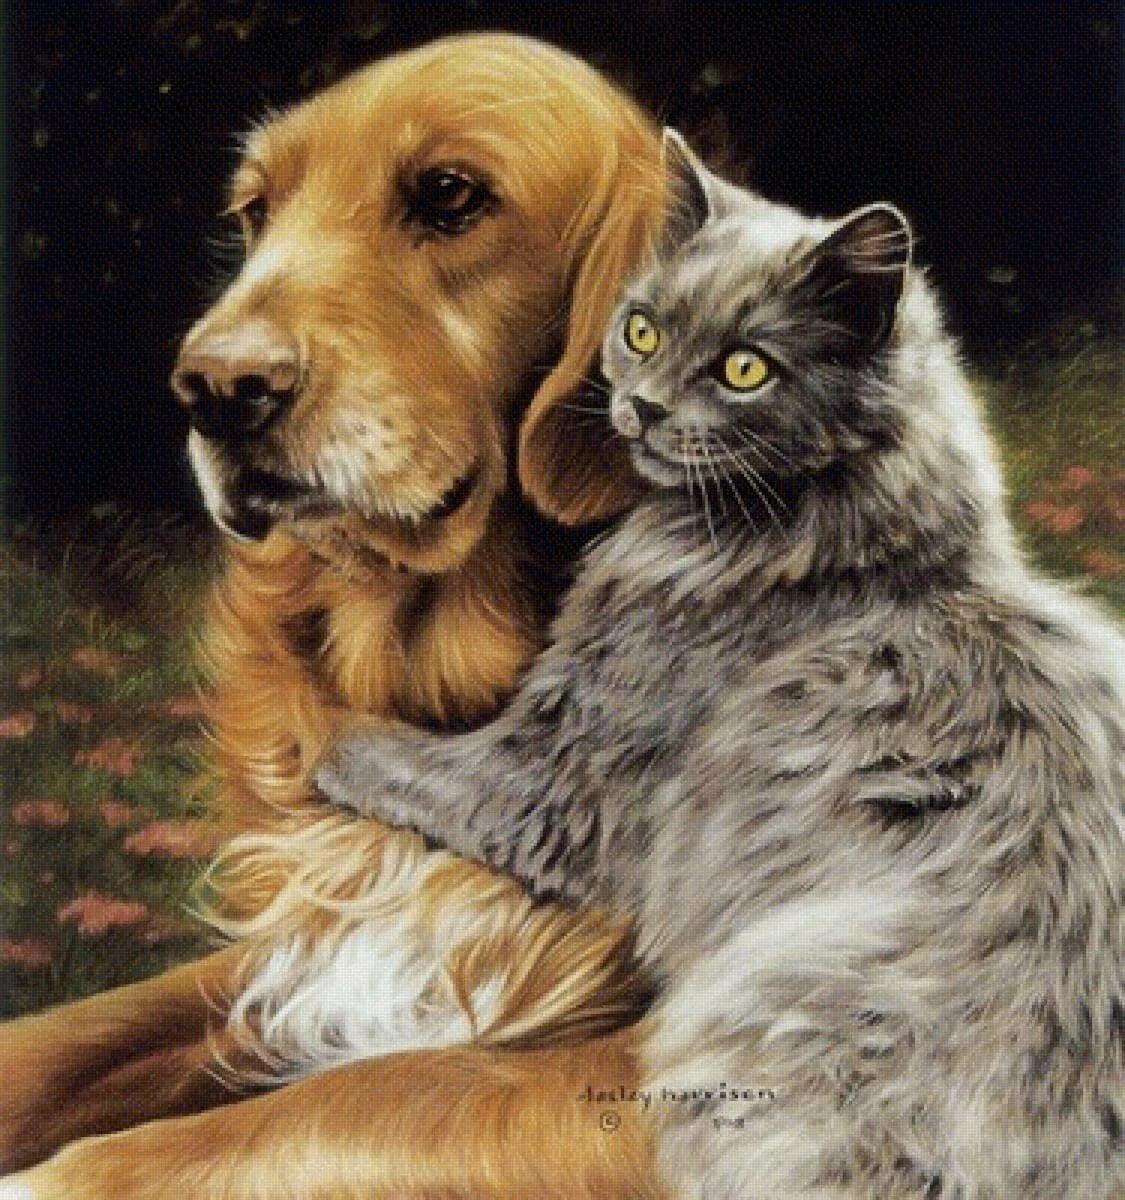 обеденной картинки кот и собака во дворец мужеством несете свою